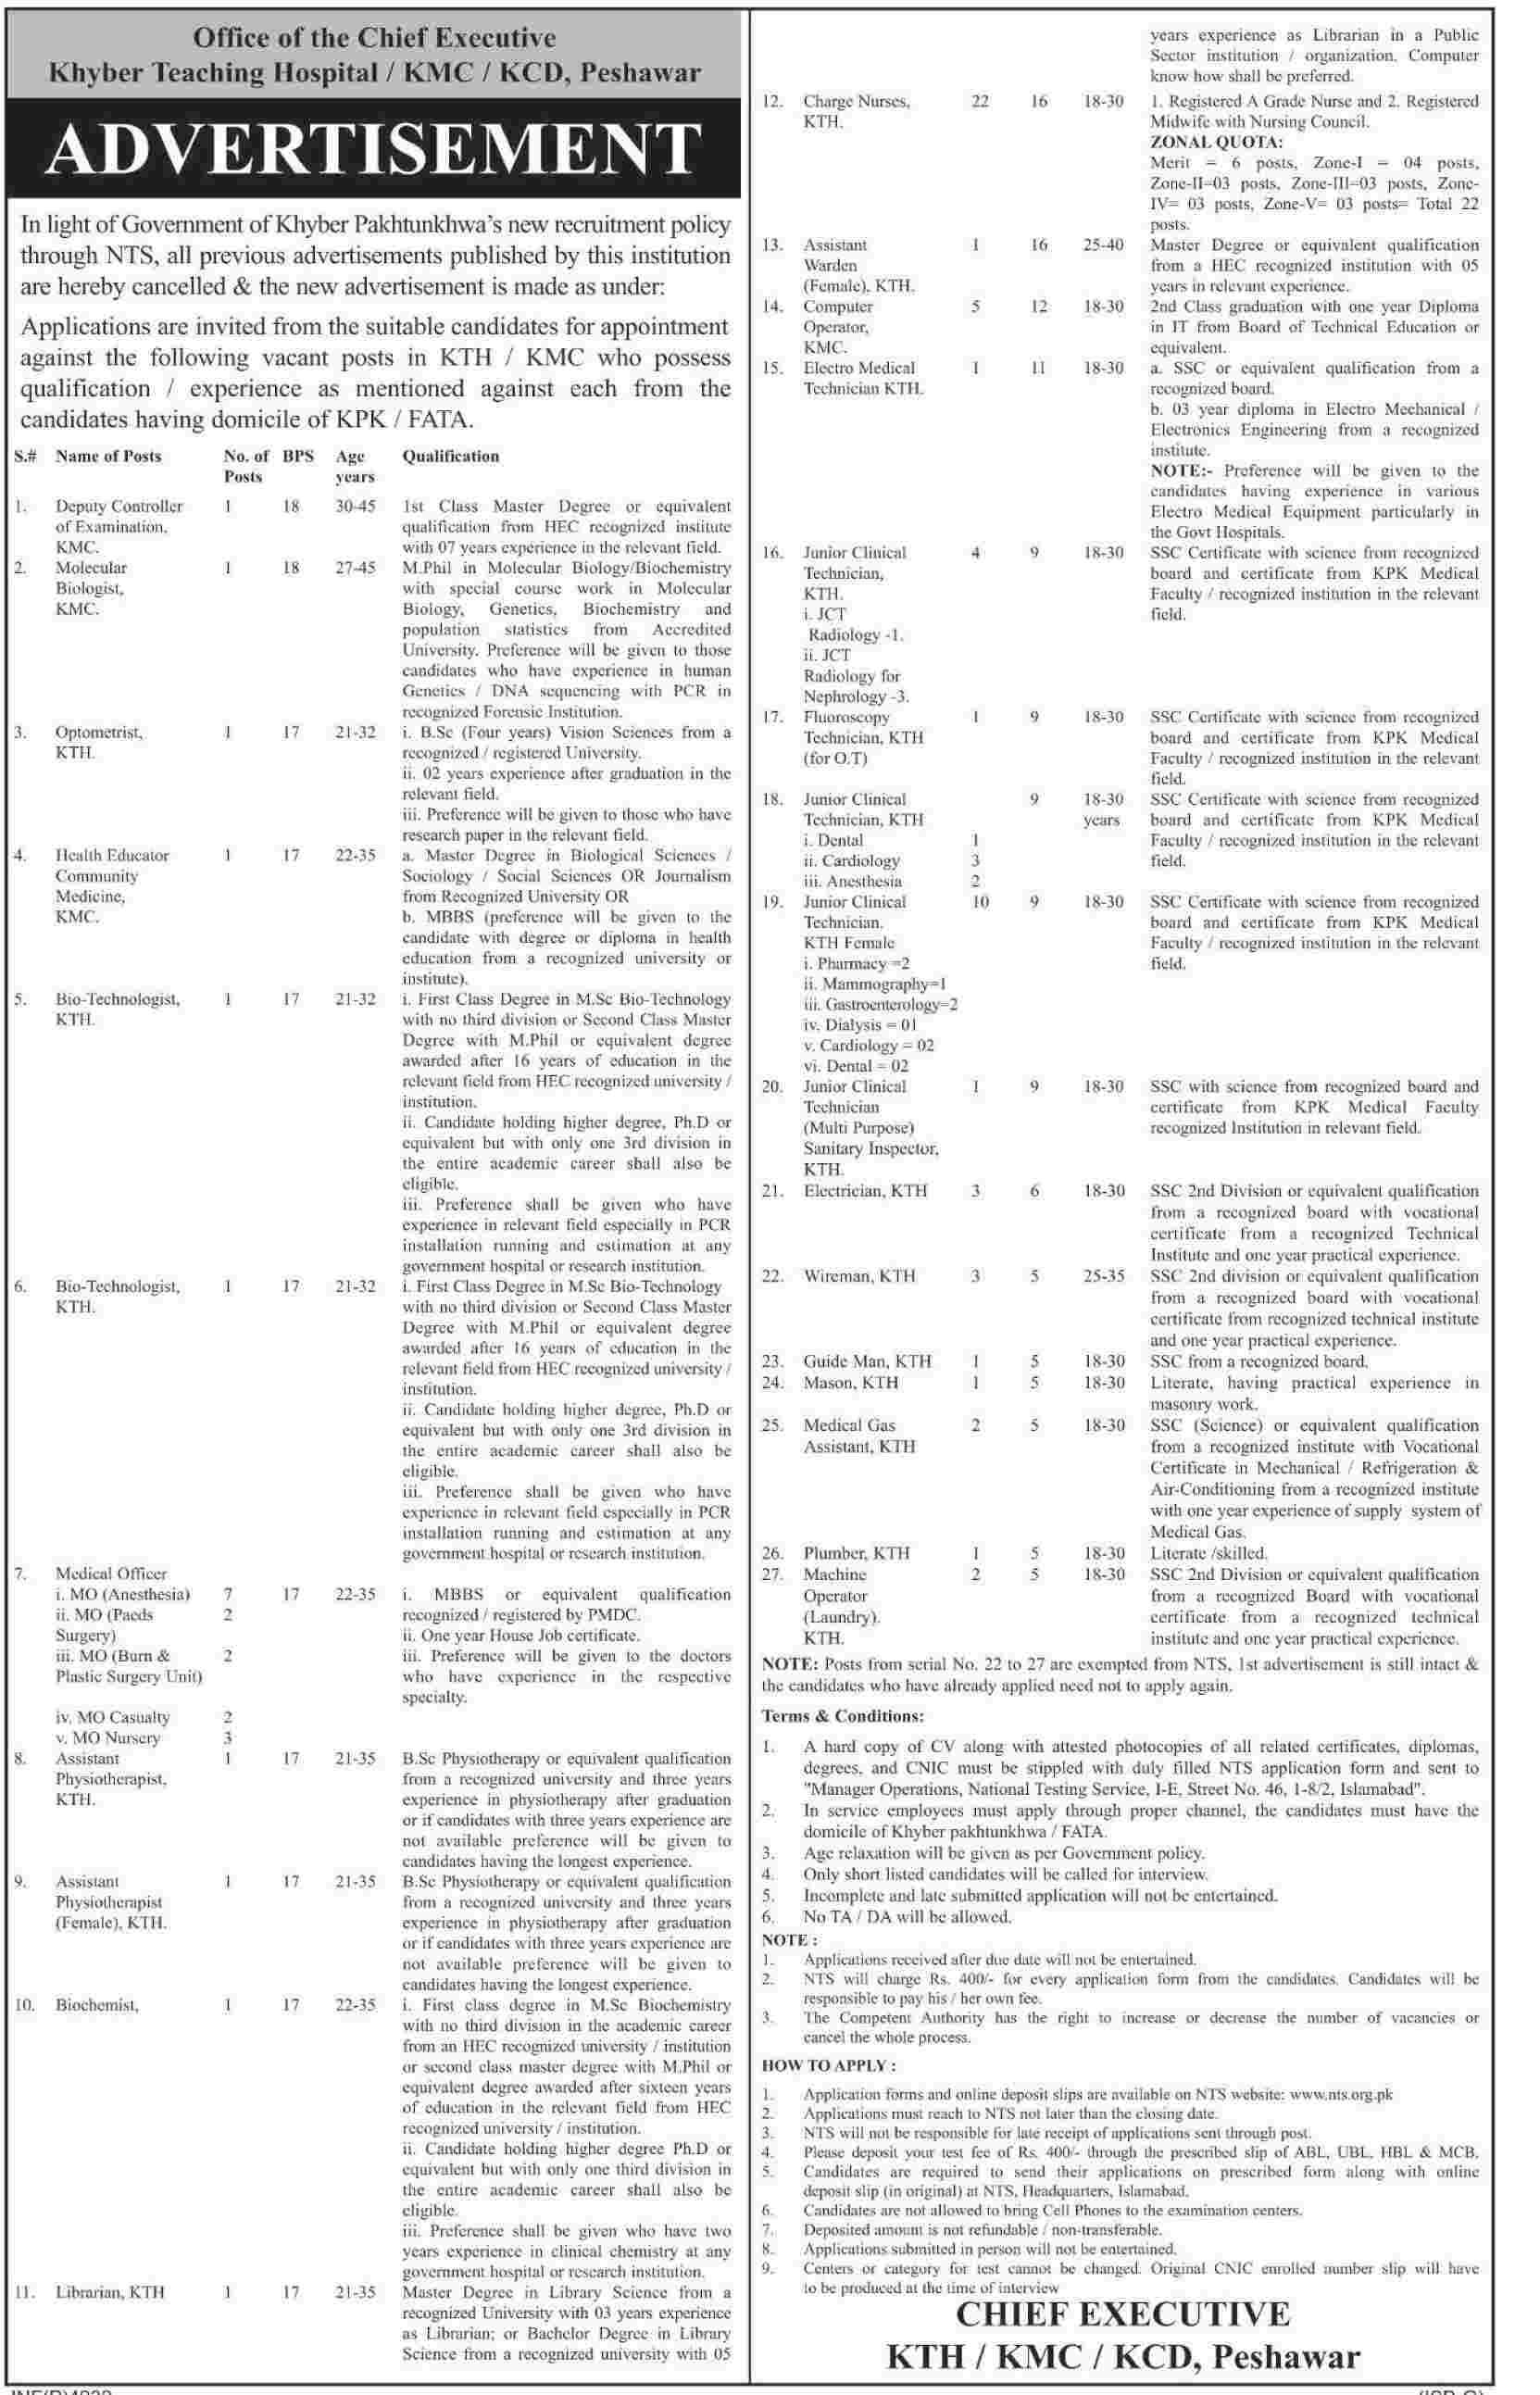 Khyber Teaching Hospital Peshawar NTS Jobs 2014-2015 Form, Last Date